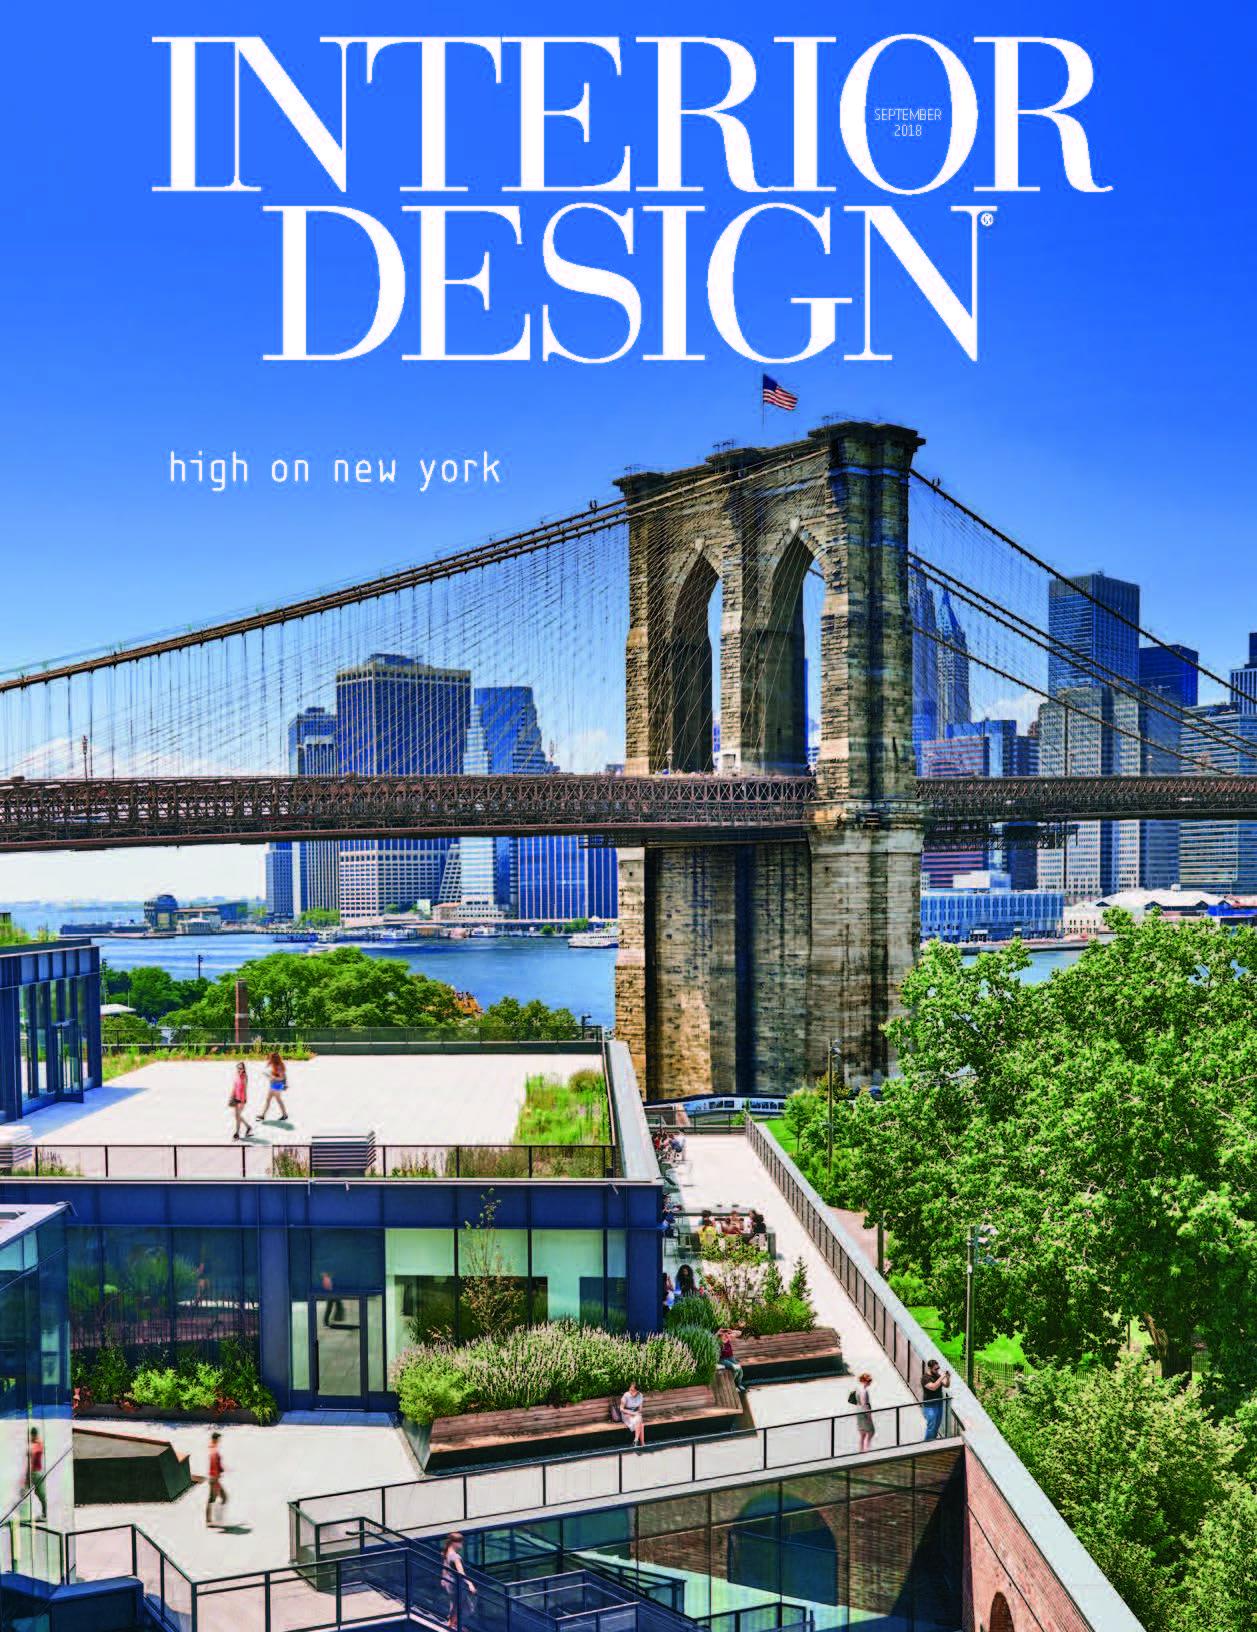 Interior Design, Sept. 2018_Page_1.jpg